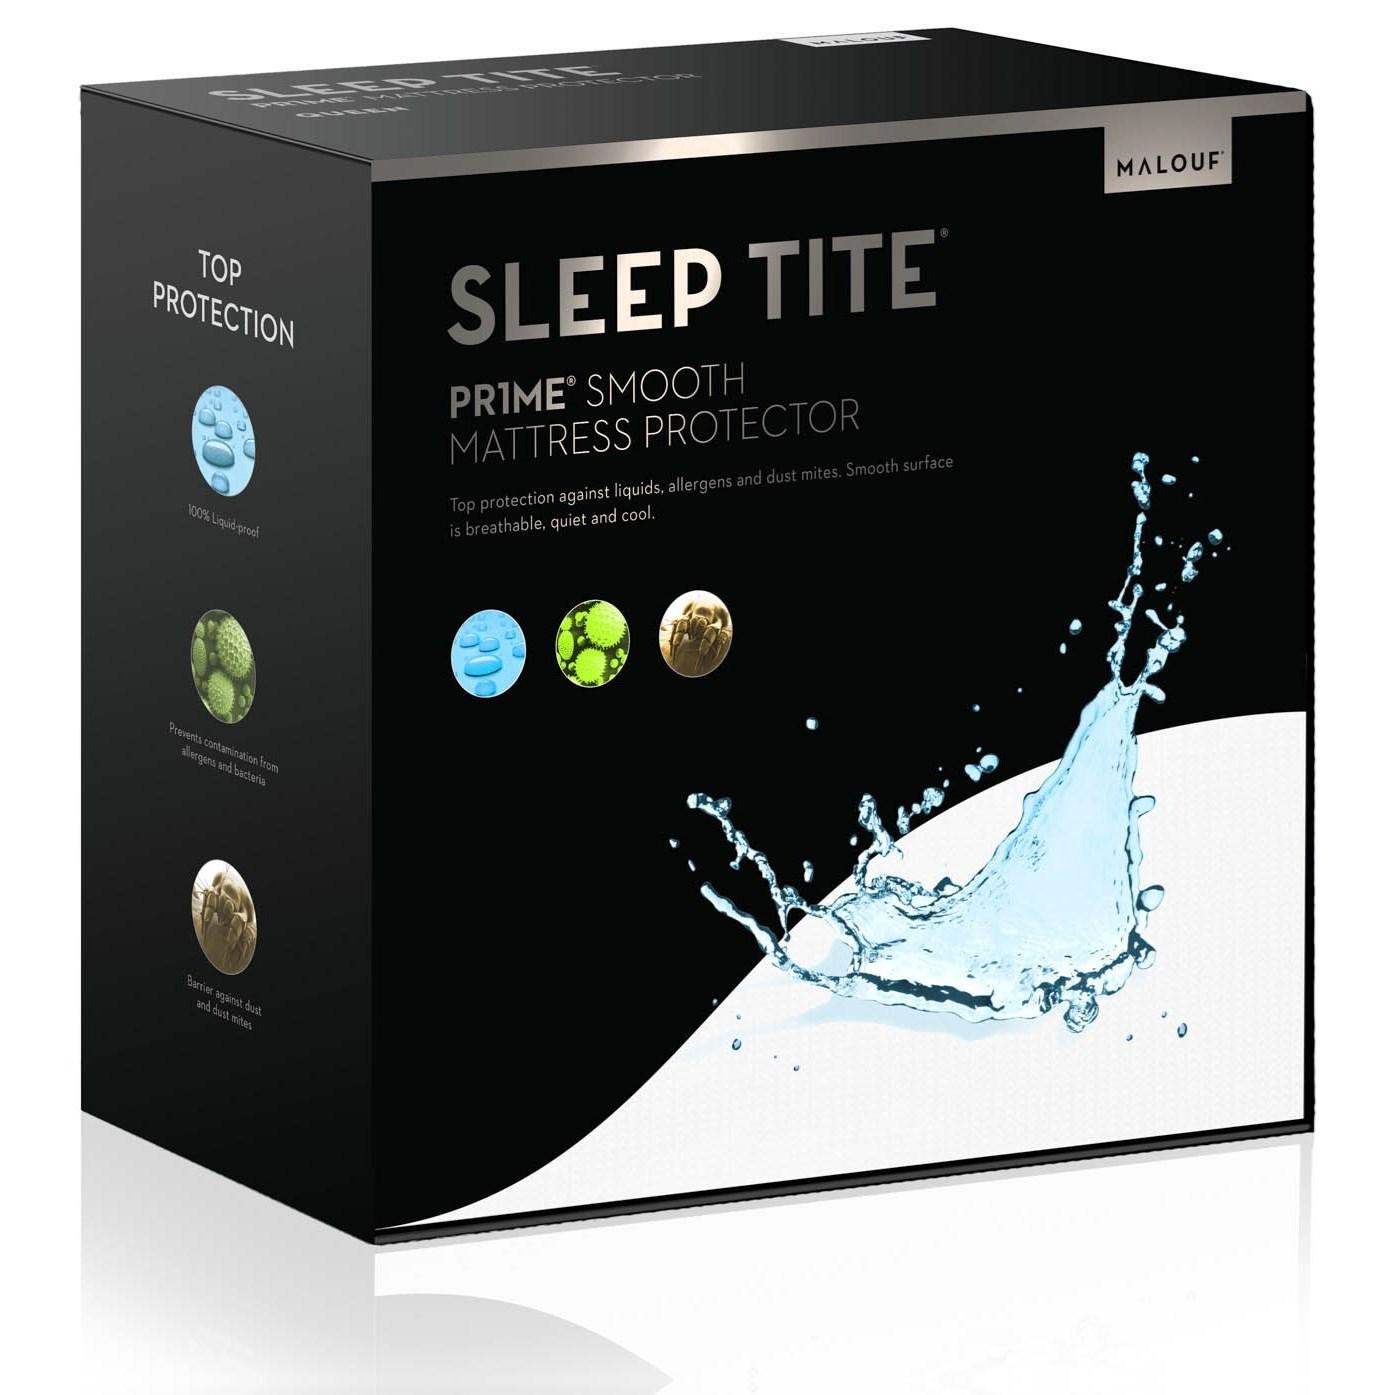 Malouf Pr1me Smooth Standard Pr1me Smooth Pillow Protector - Item Number: SL0PSTPP